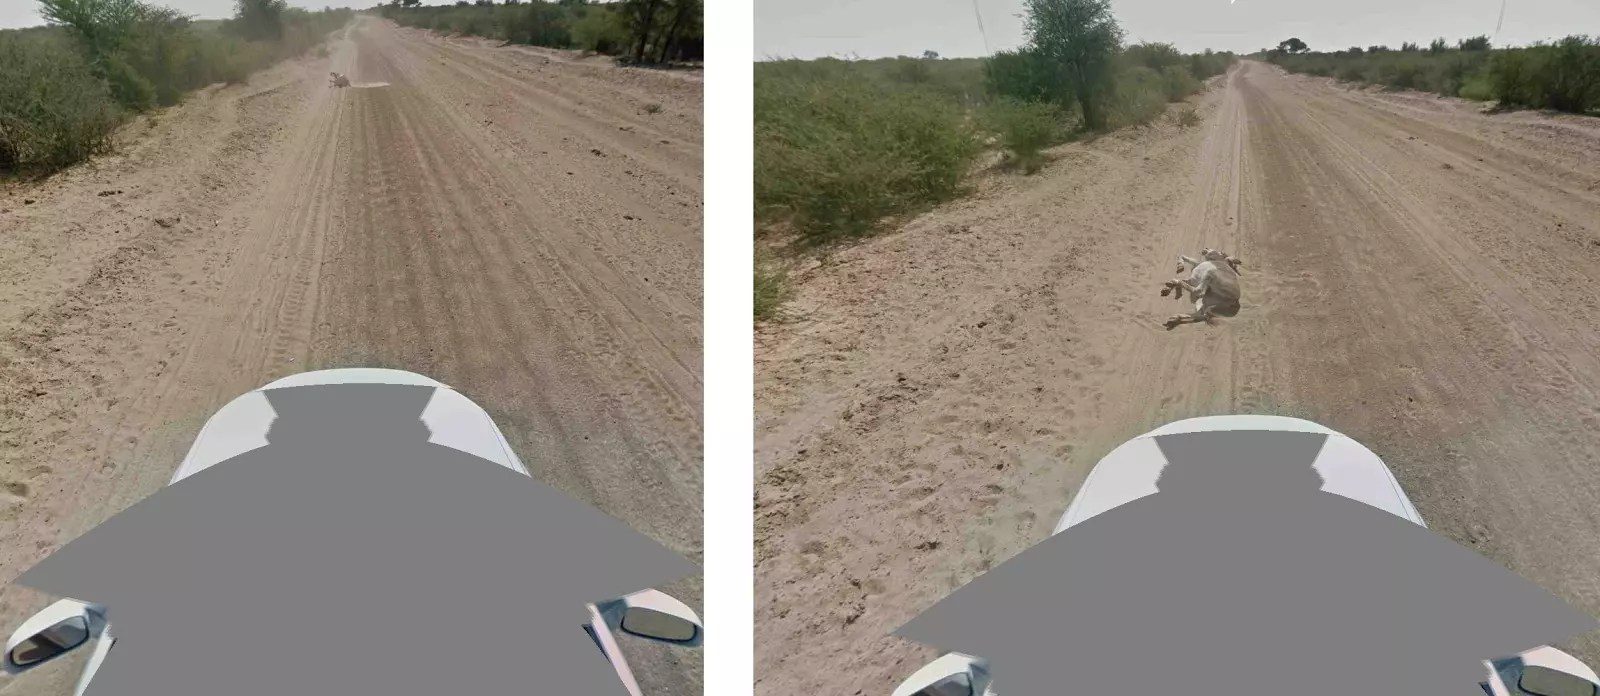 burro atropellado google street view 2